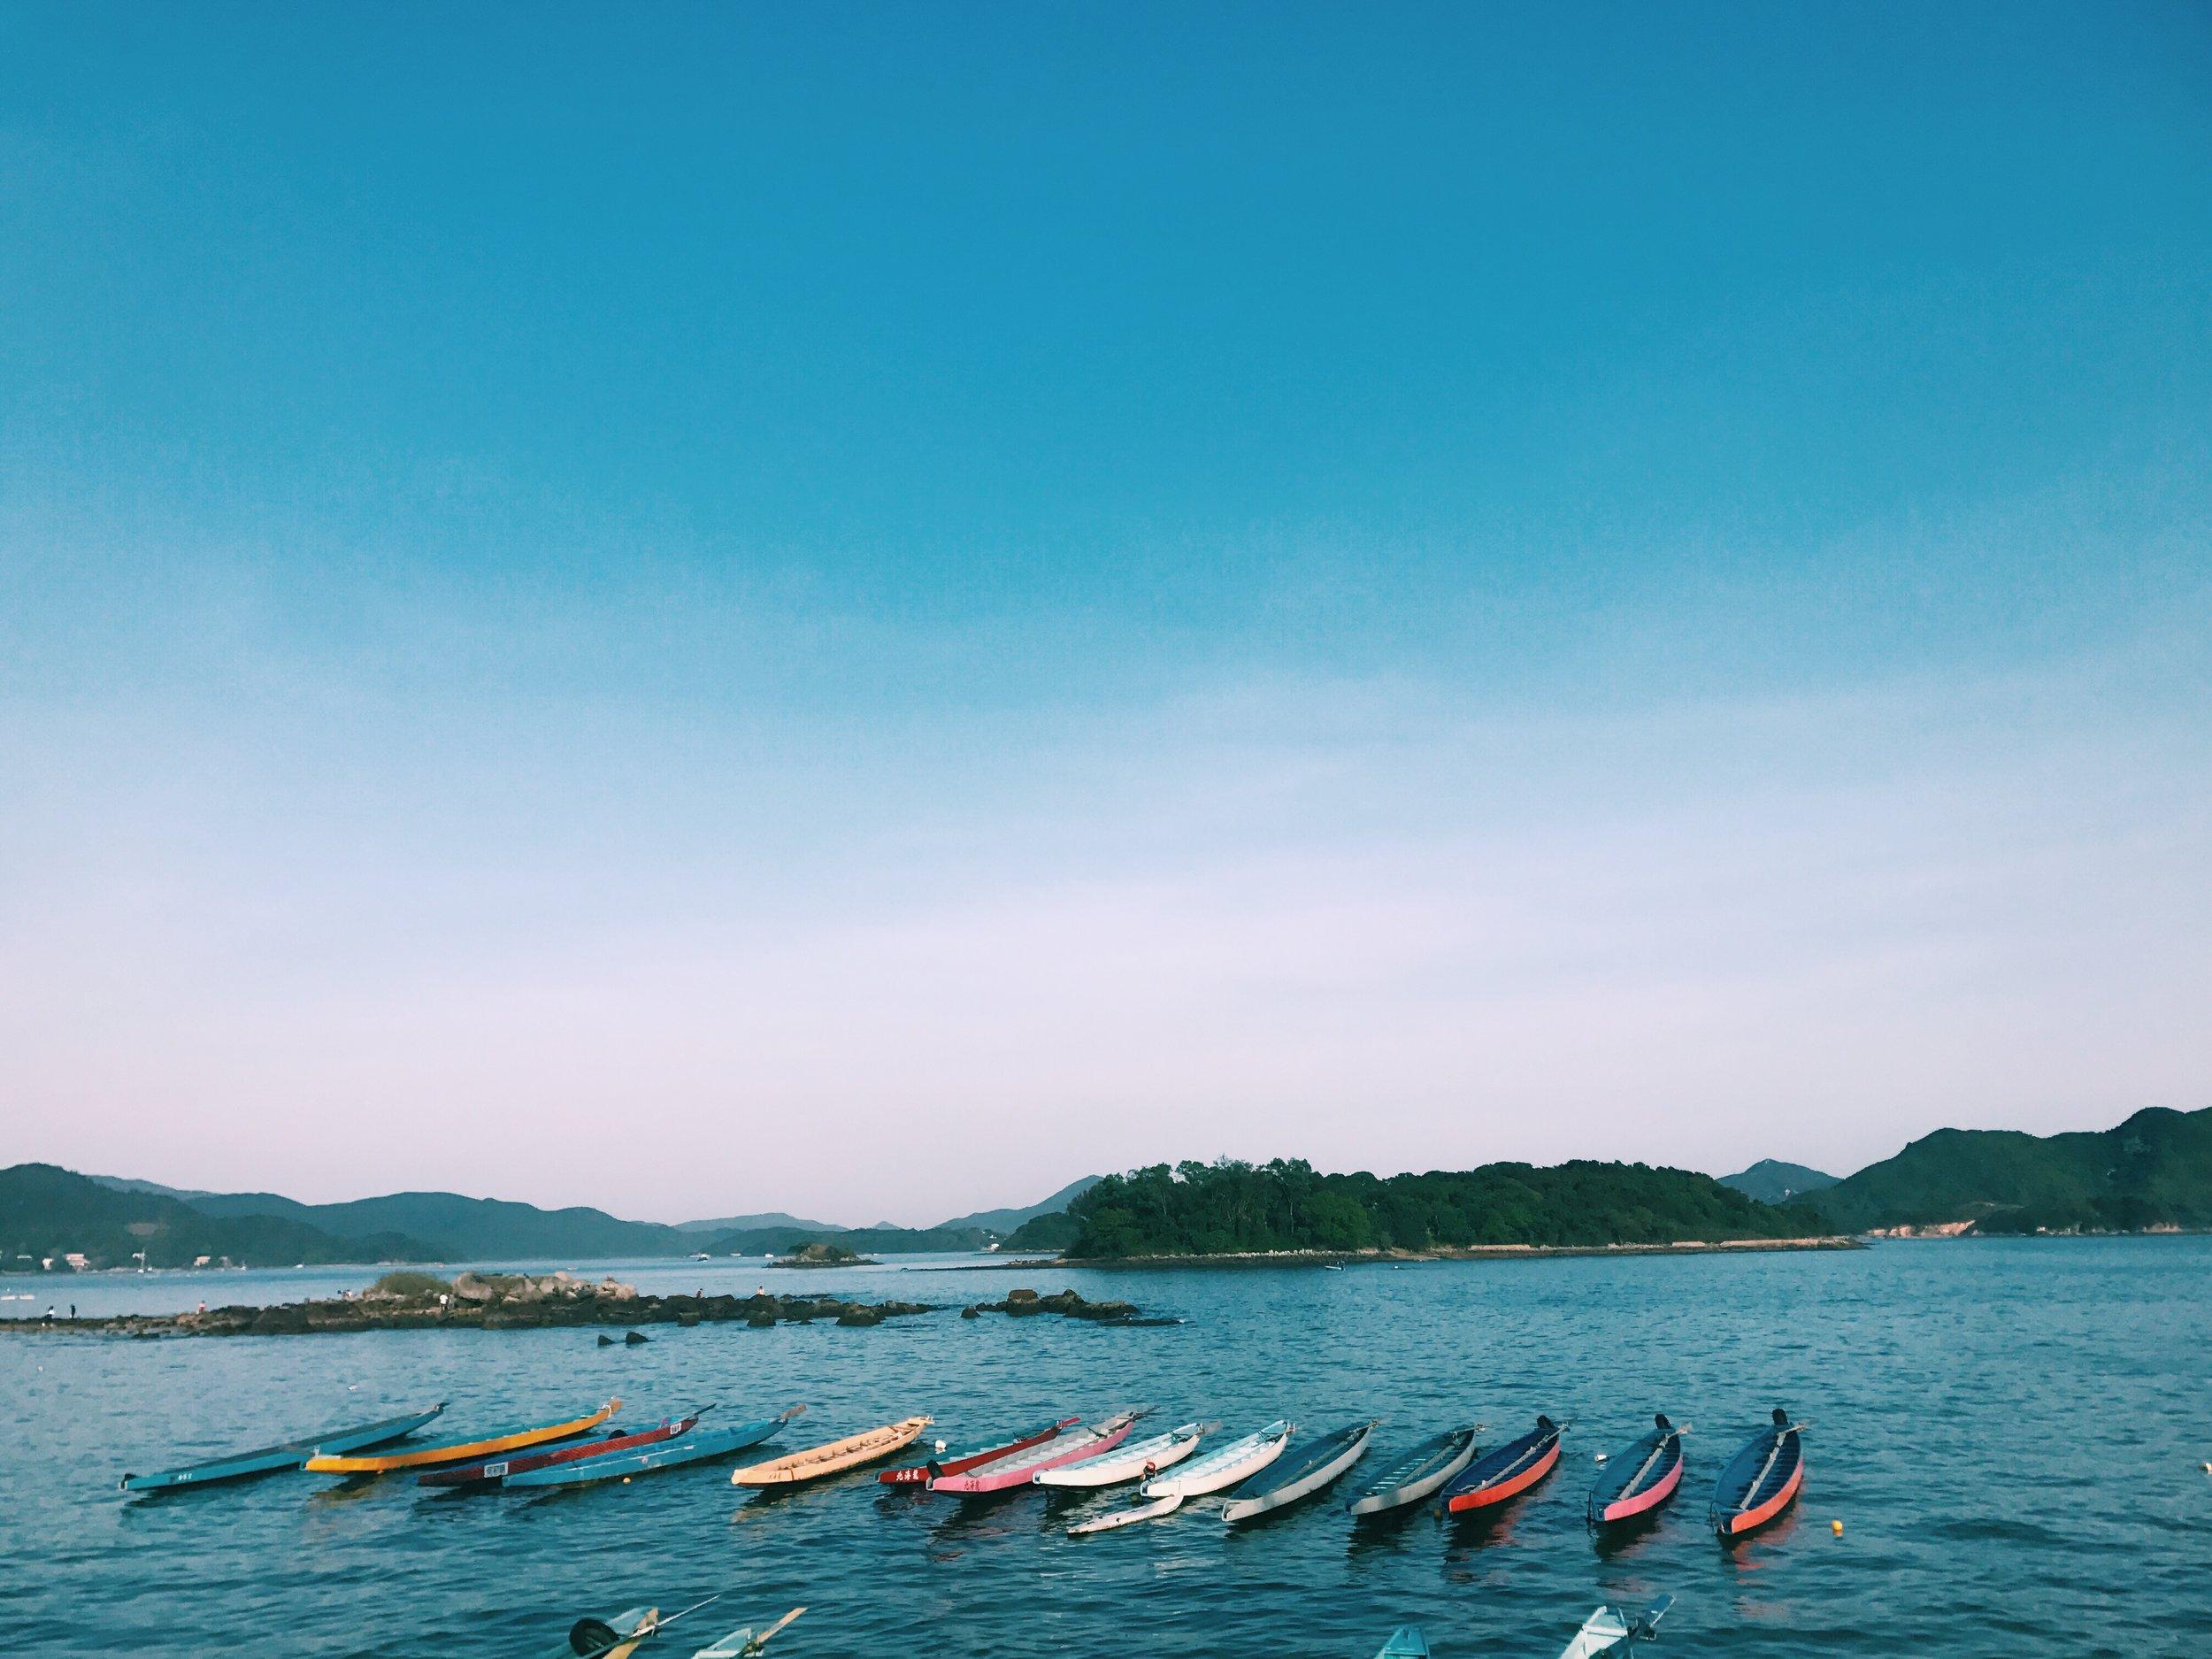 boats in Sai Kung